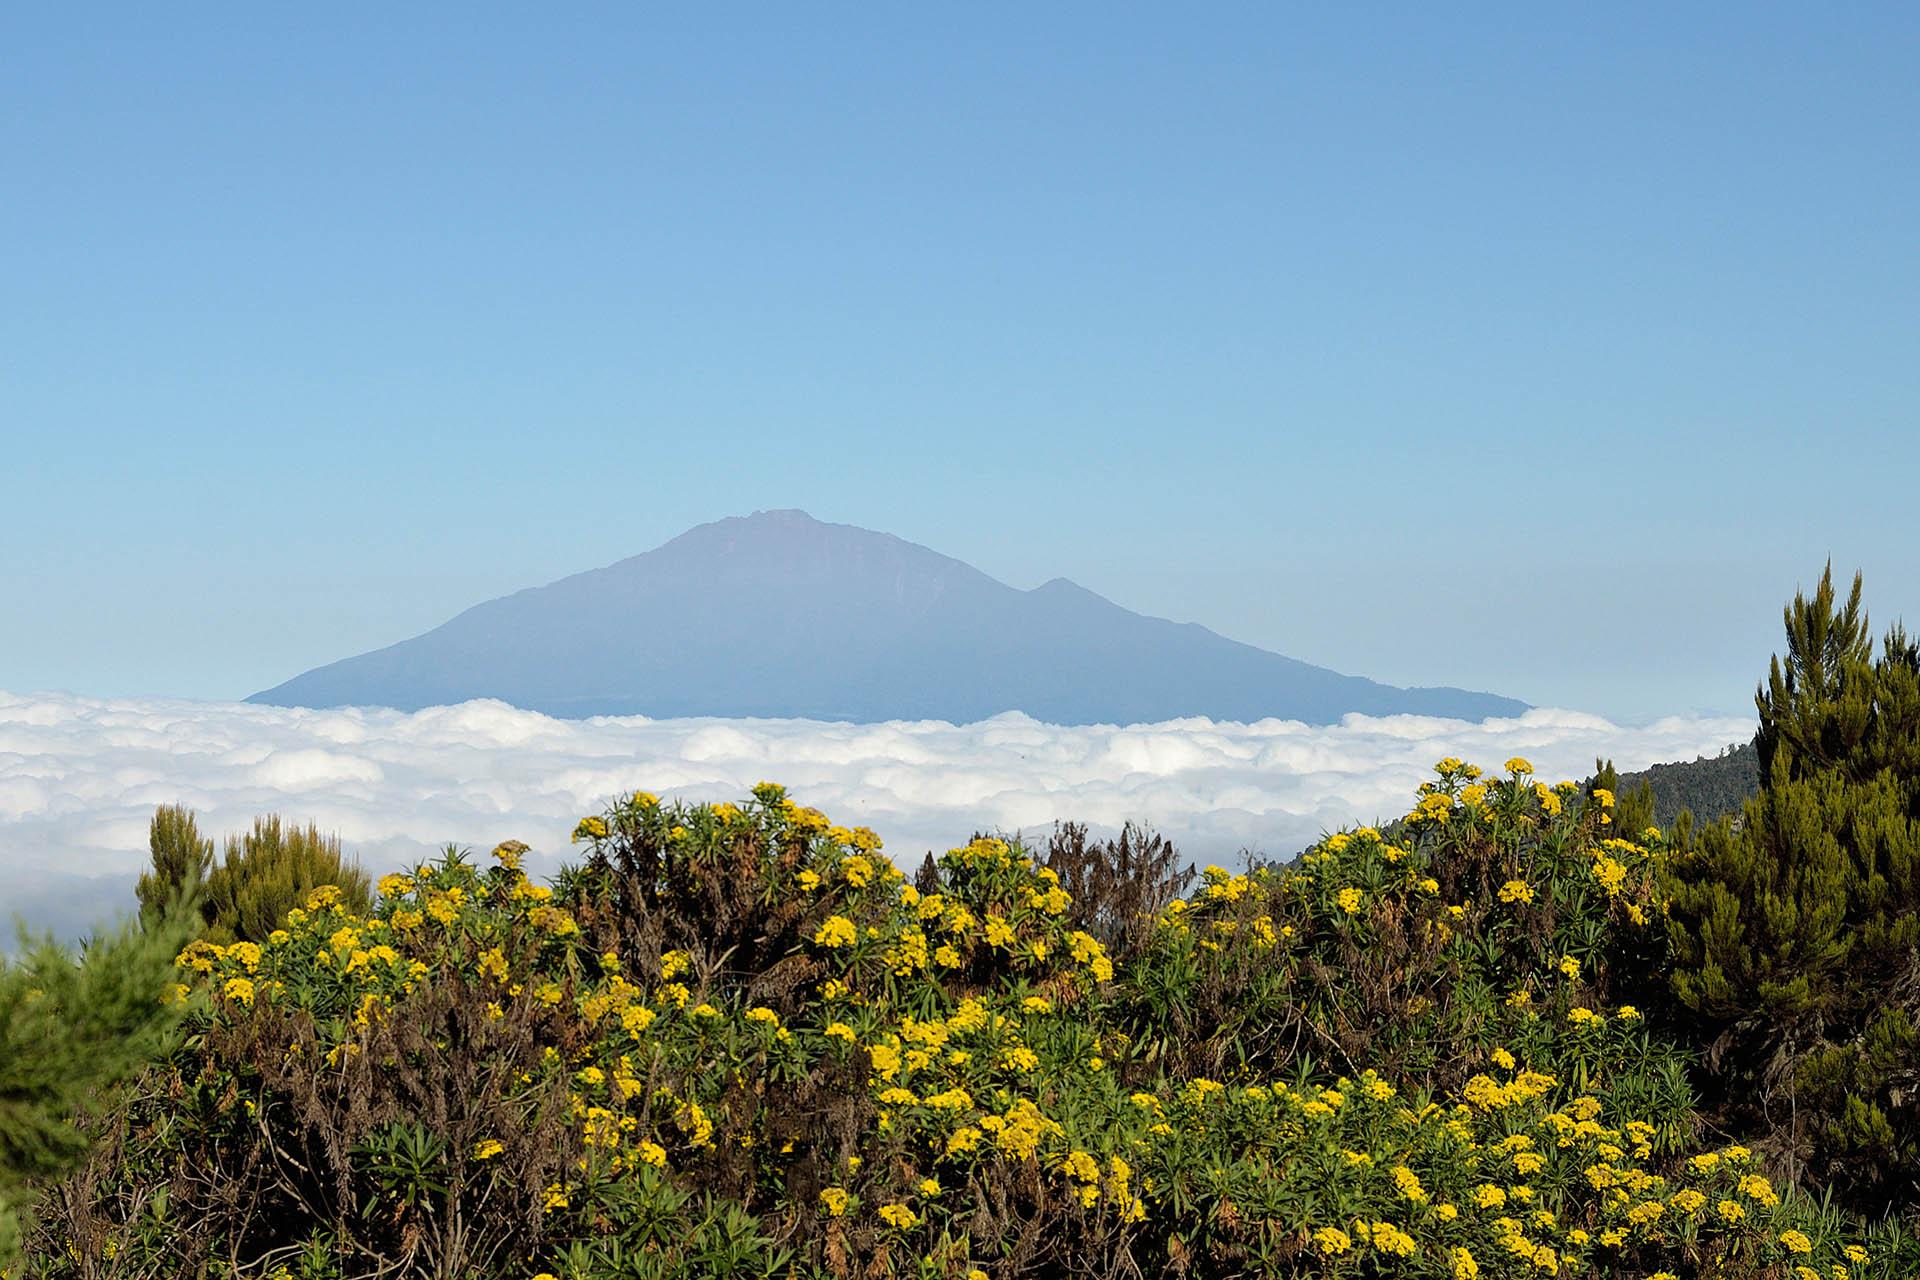 machame-scheduled-departure-mt-kilimanjaro-trekking-itineraries-maasai-wanderings-tanzania-africa